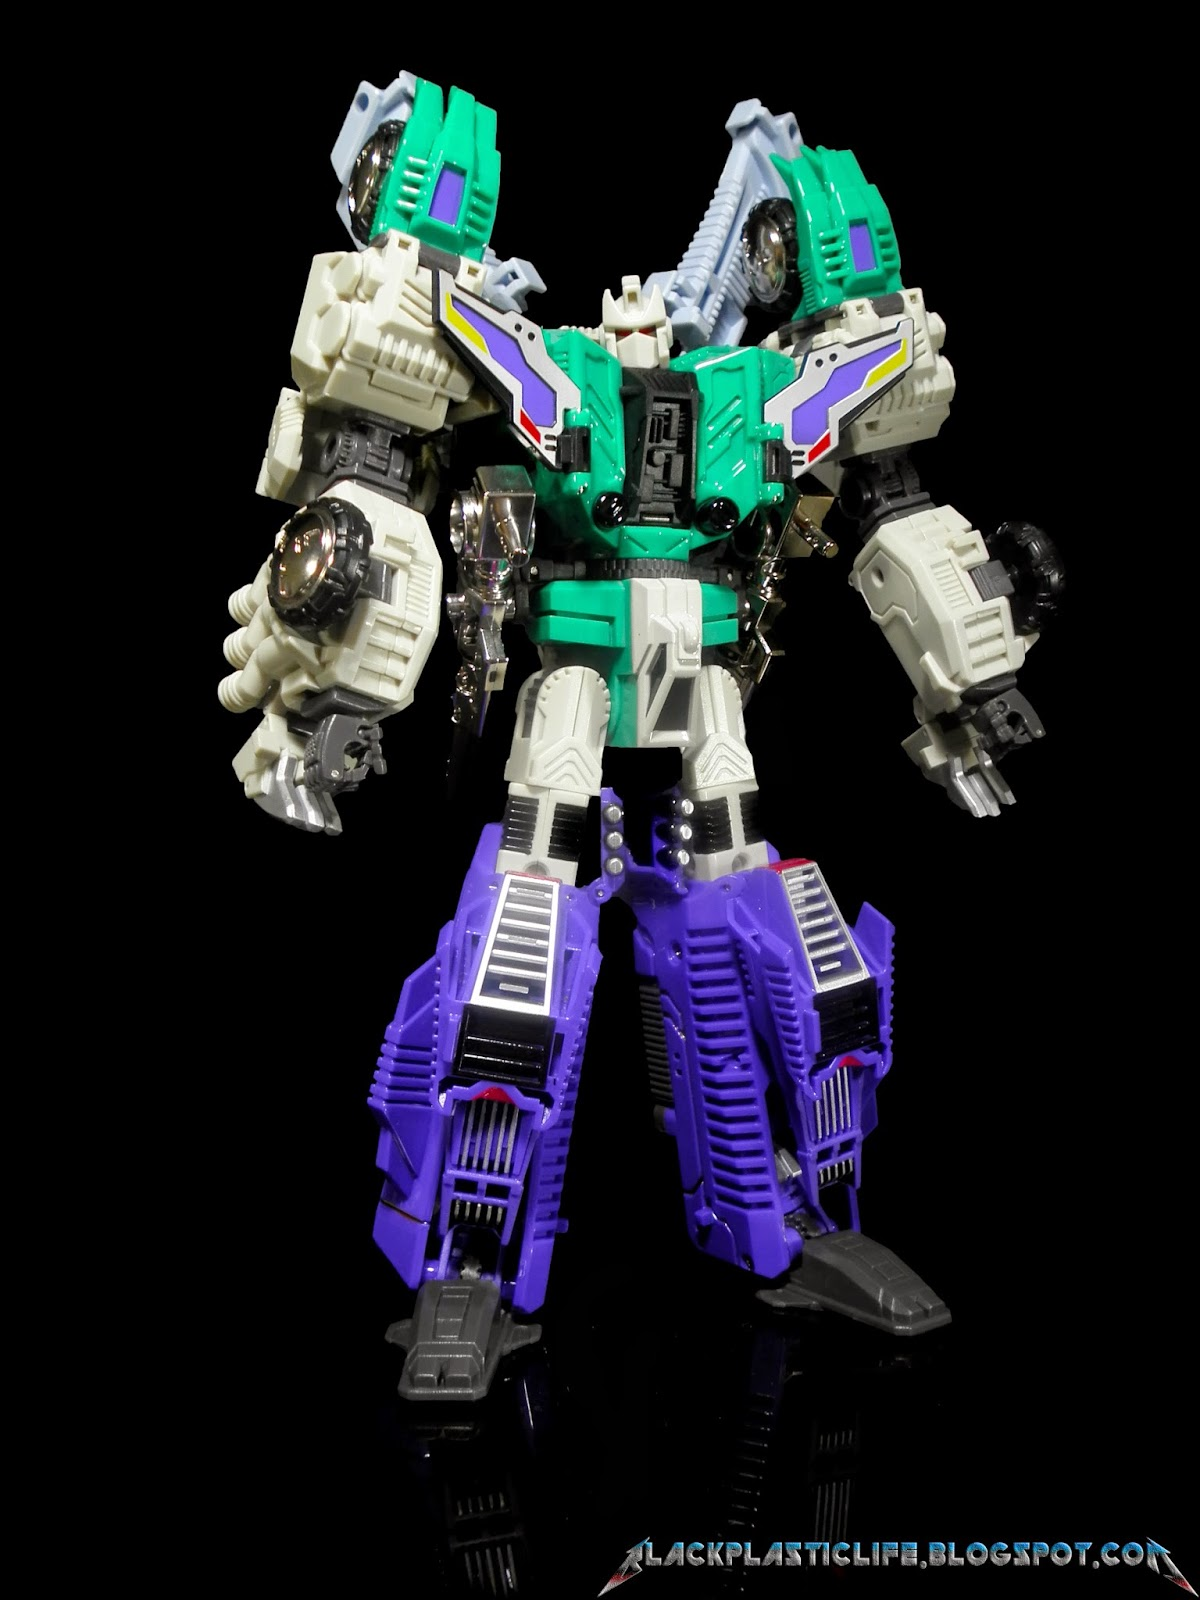 [Masterpiece Tiers] MMC R-01C CONTINUUM HEXATRON aka SIXSHOT - Sortie Nov. 2014 QeWXmsg7